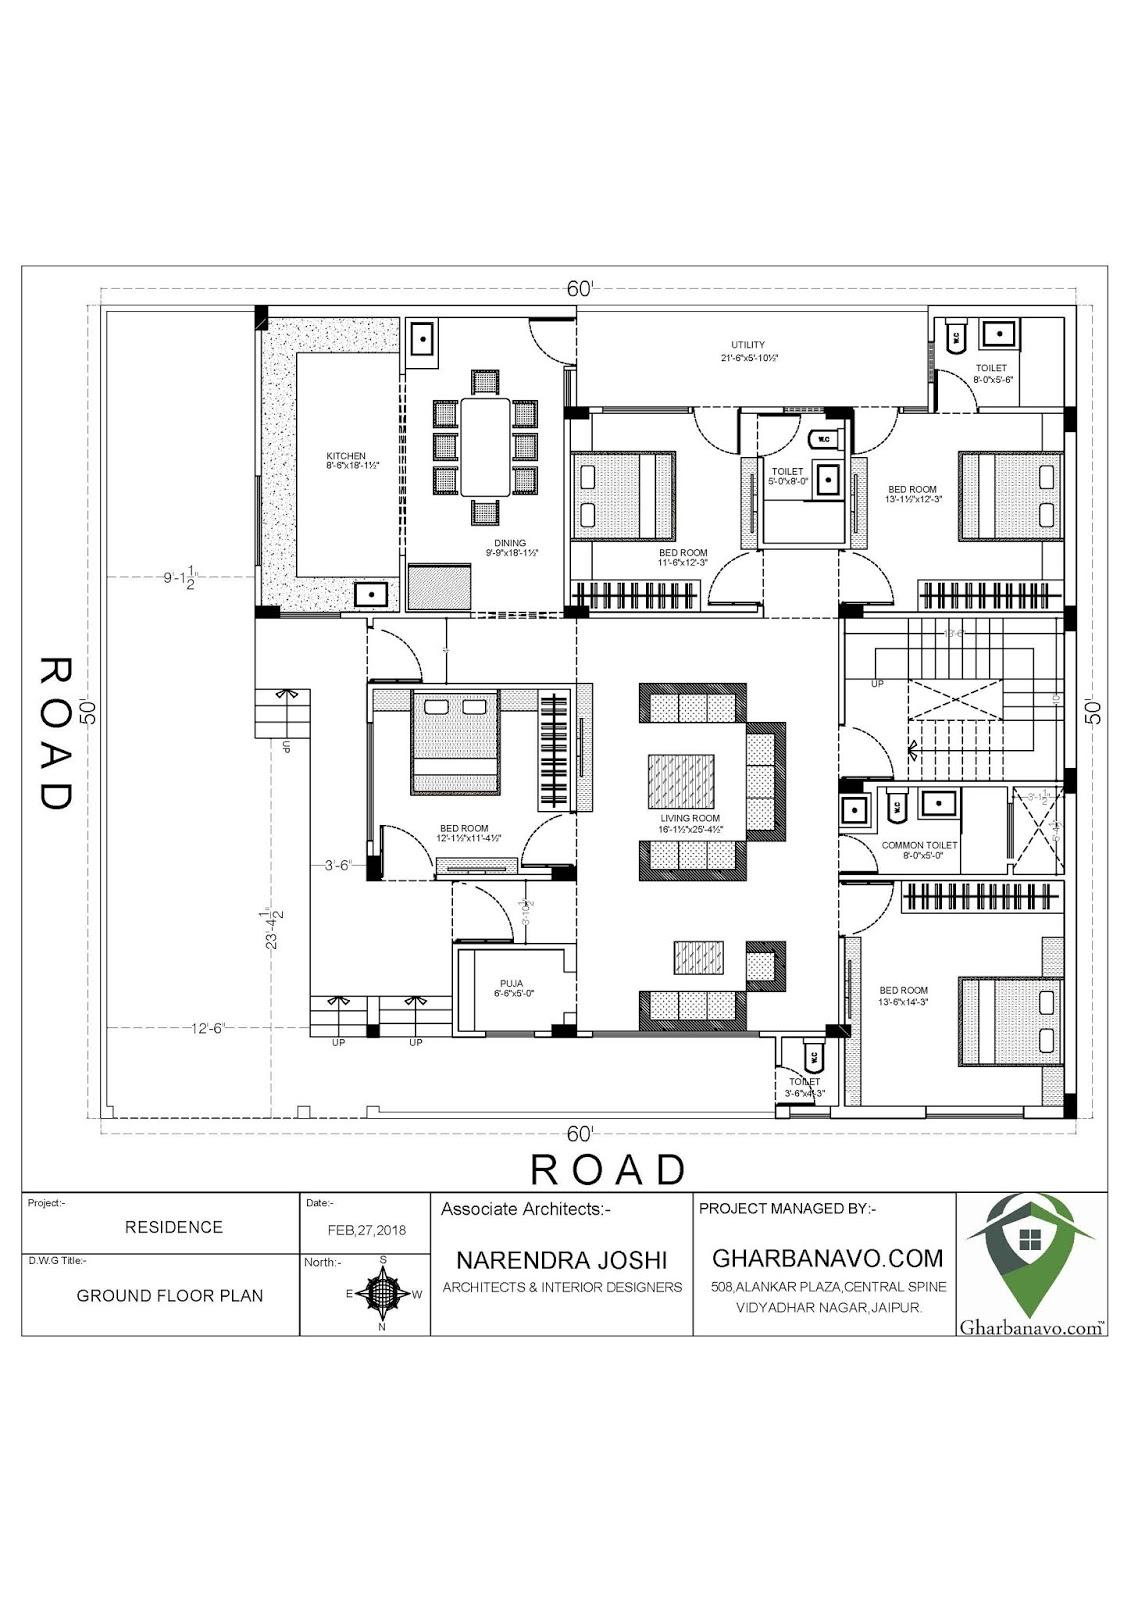 Gharbanavo Com Free House Plan 60 50 Home Maps